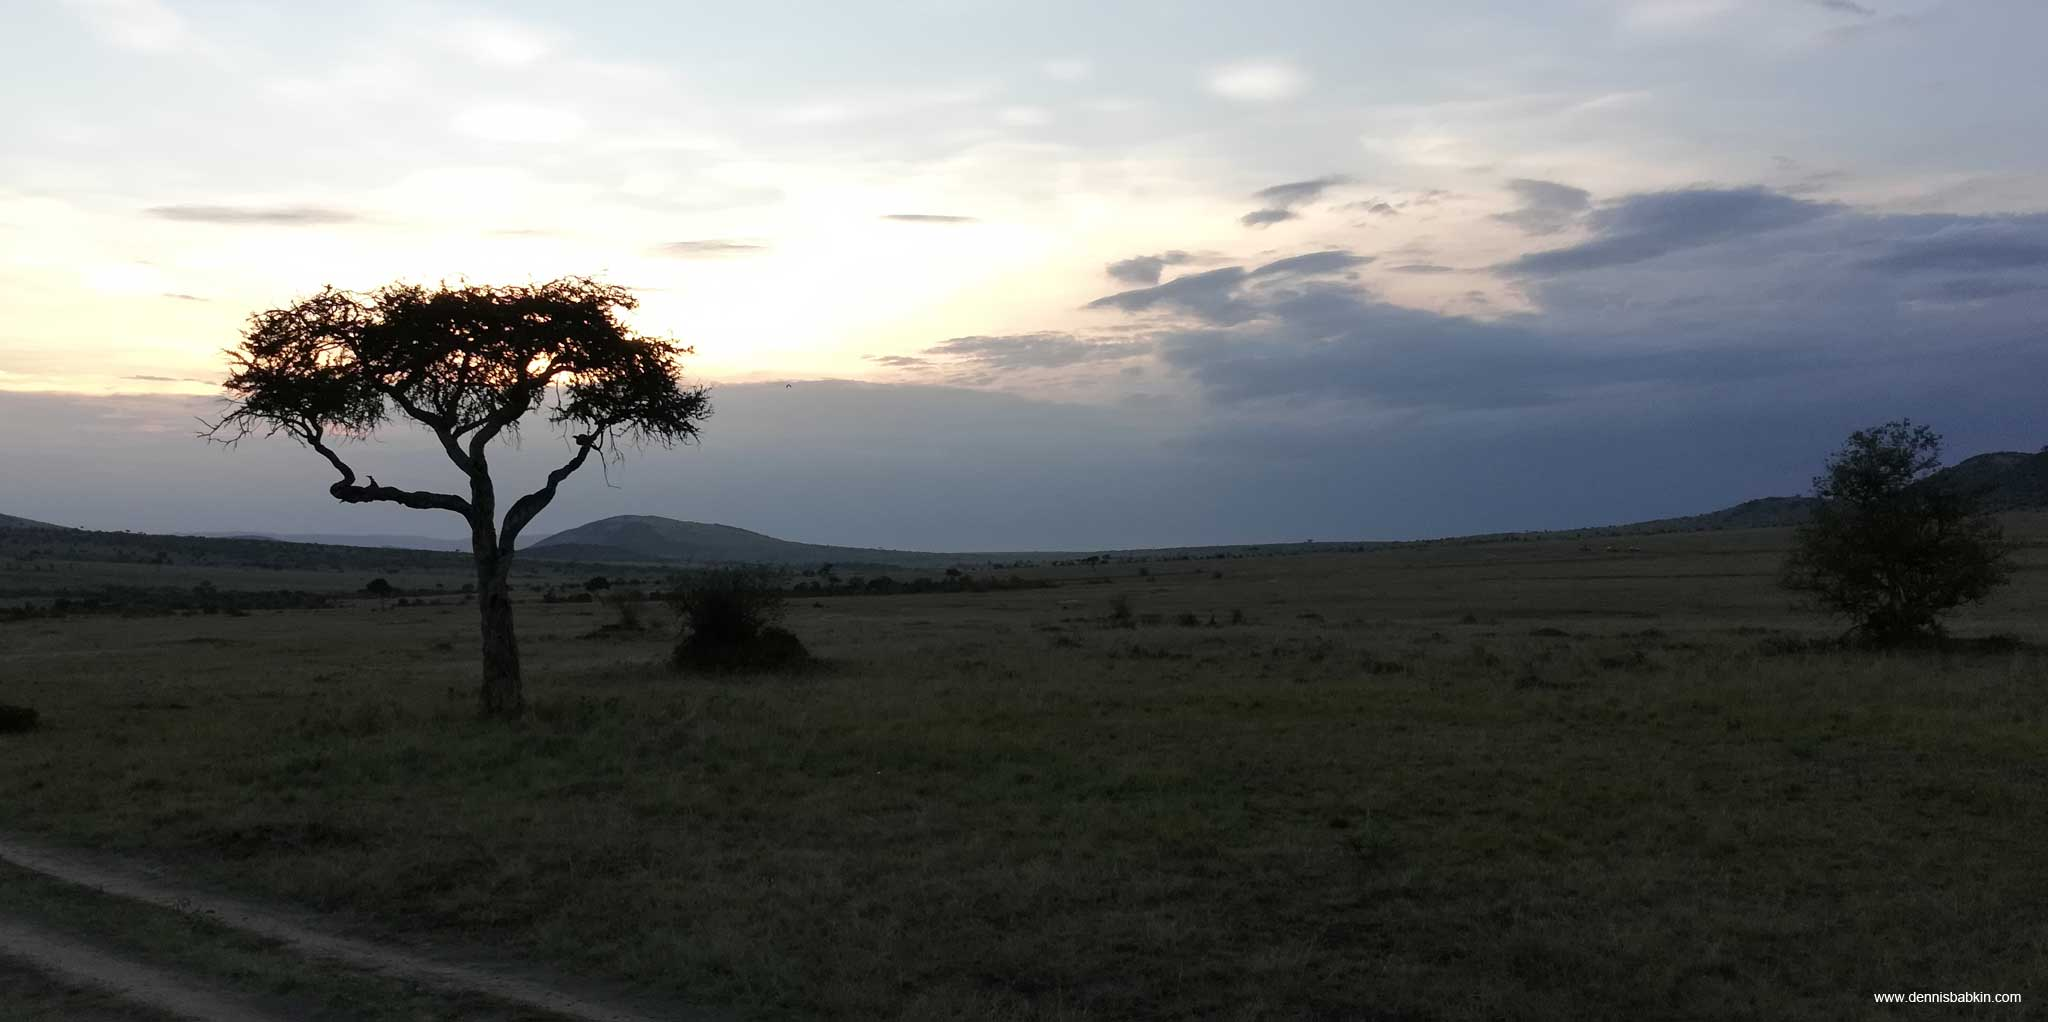 Visits to Kenya - Things to visit in Kenya for the Western travelers.